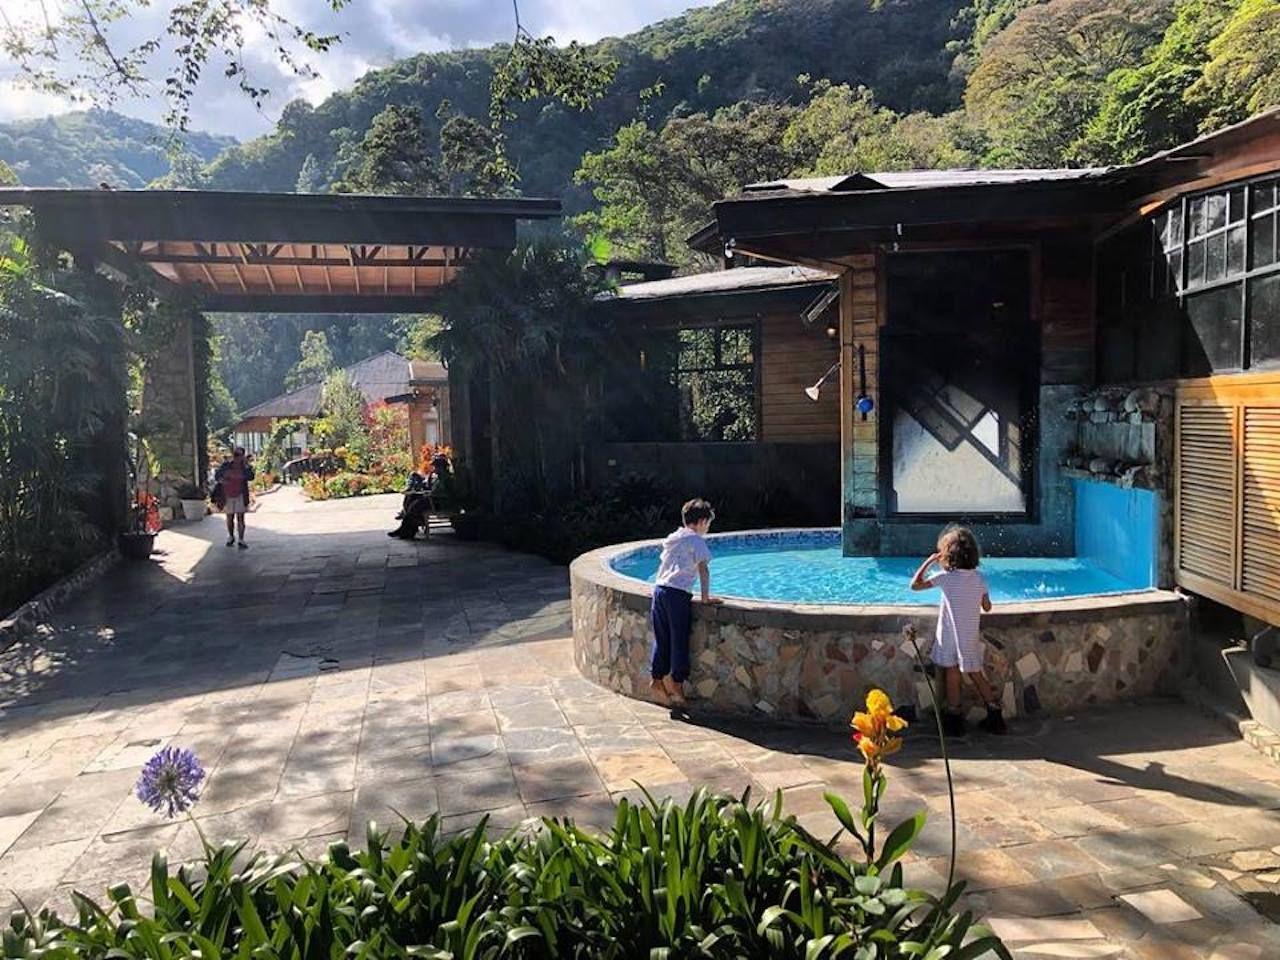 Casa Grande Bambito in Panama